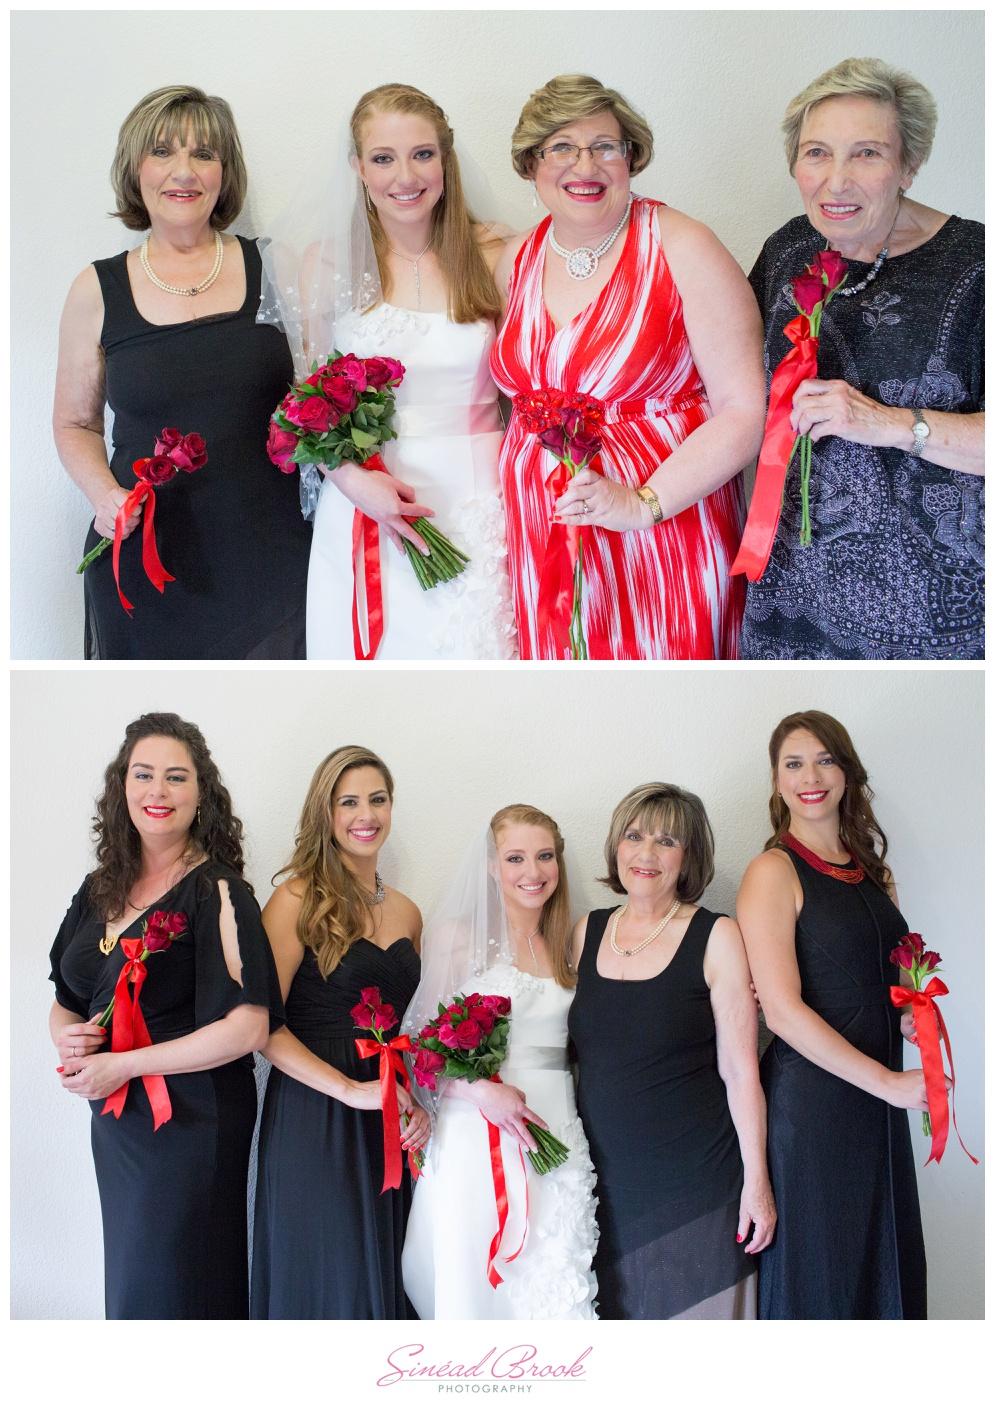 Professional Wedding Photography Sandton22